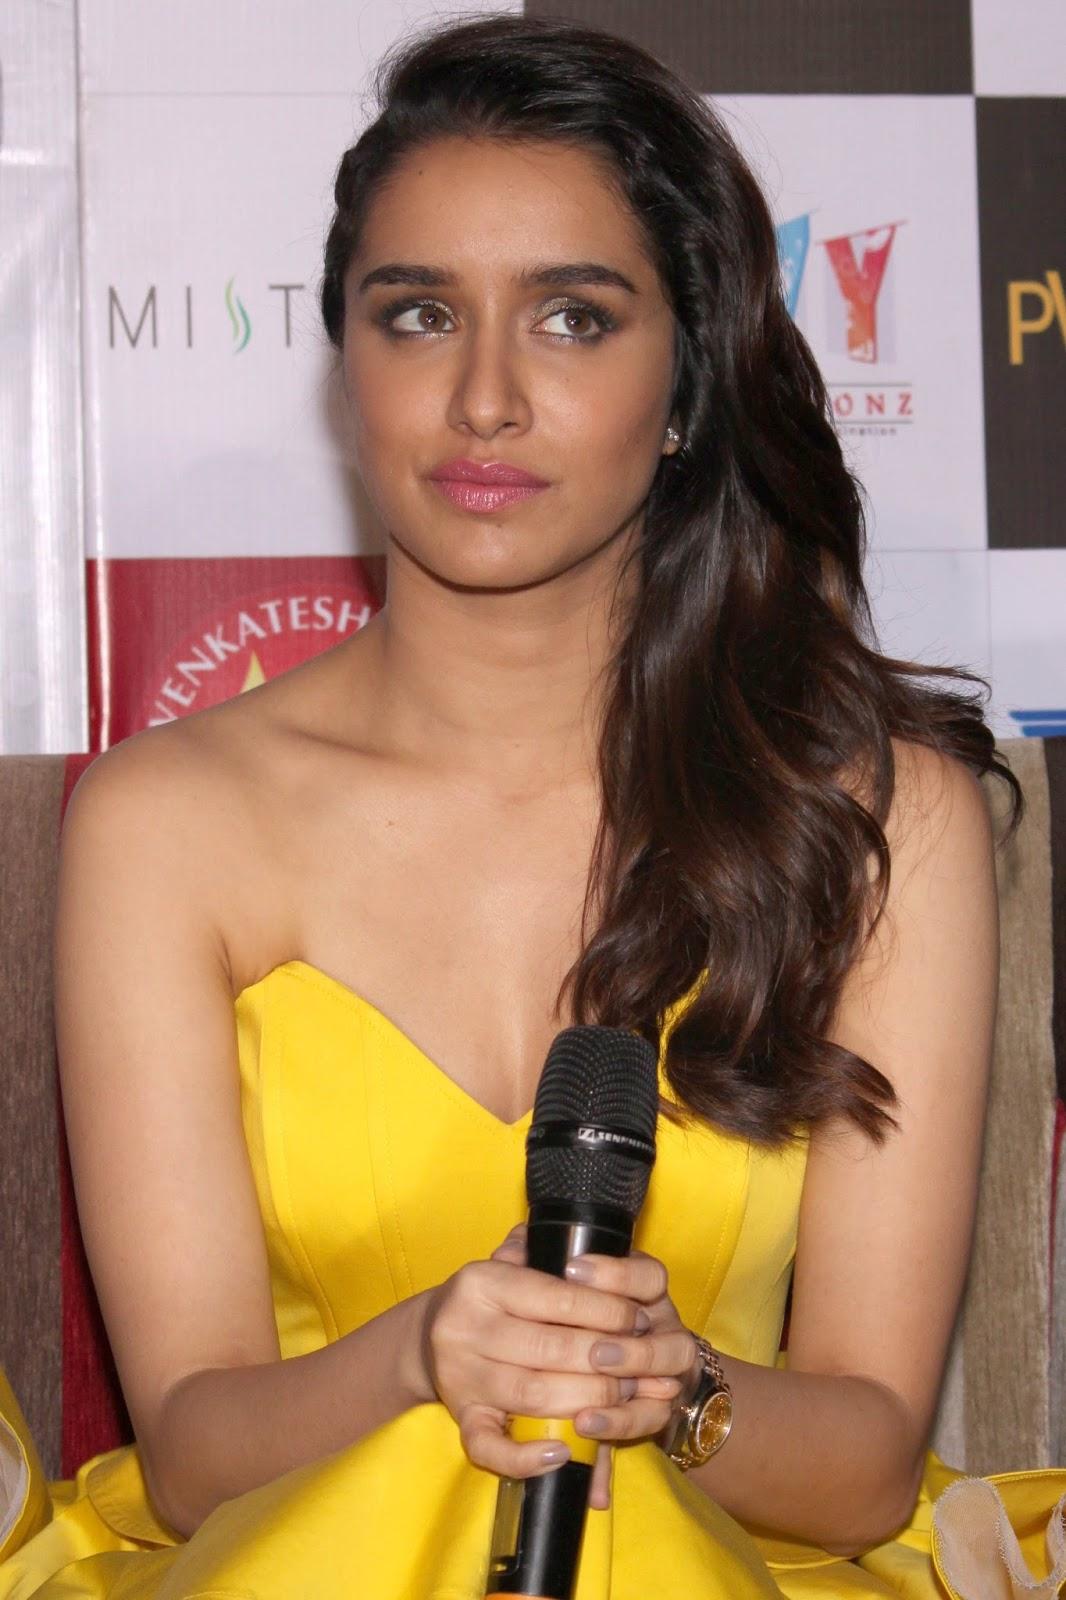 Bollywood Glamorous Hot Actress Shraddha Kapoor Photos In Yellow Dress